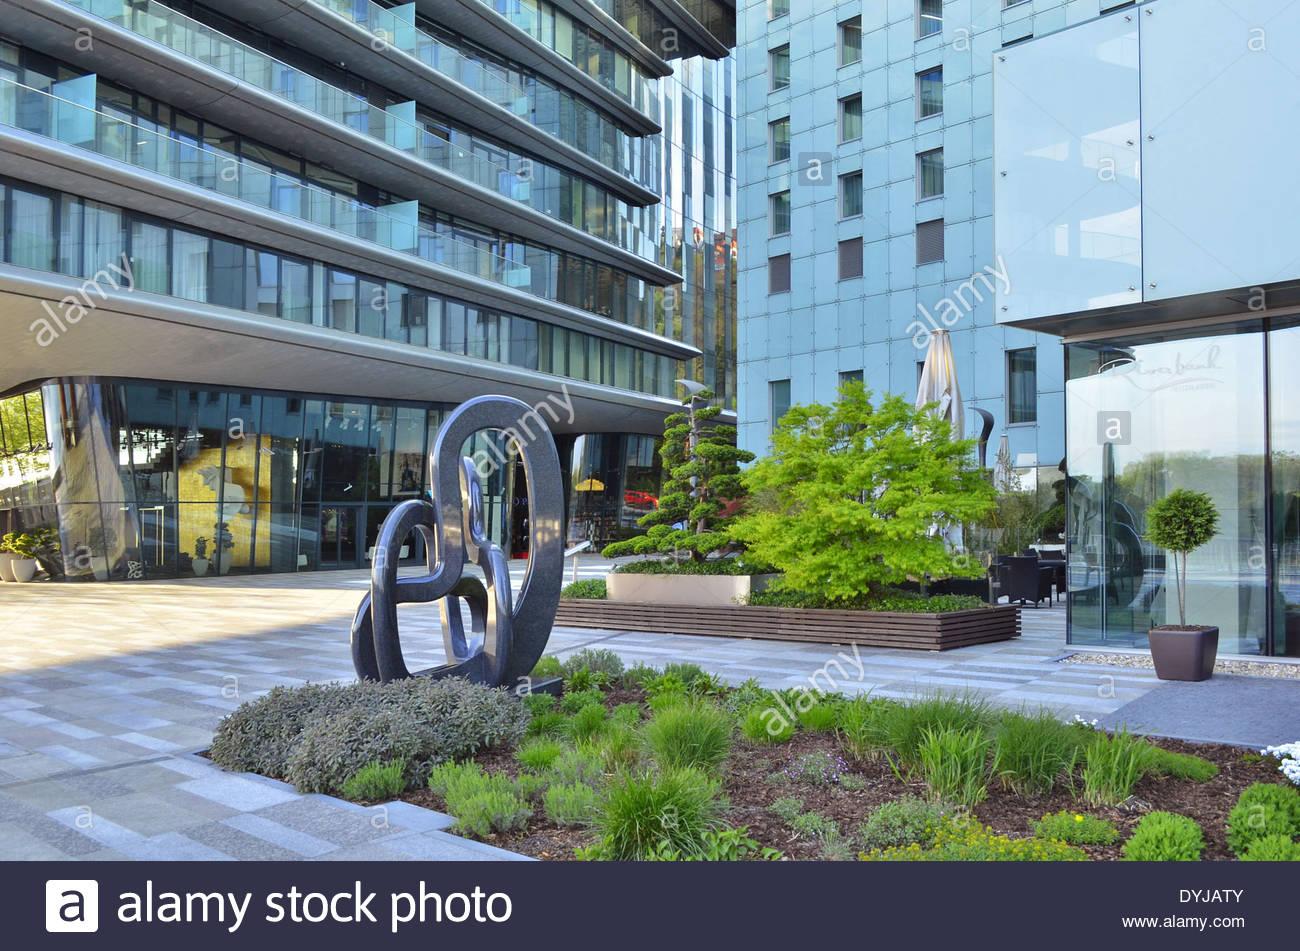 River Park - modern commercial and residential developments in Bratislava Slovakia. - Stock Image